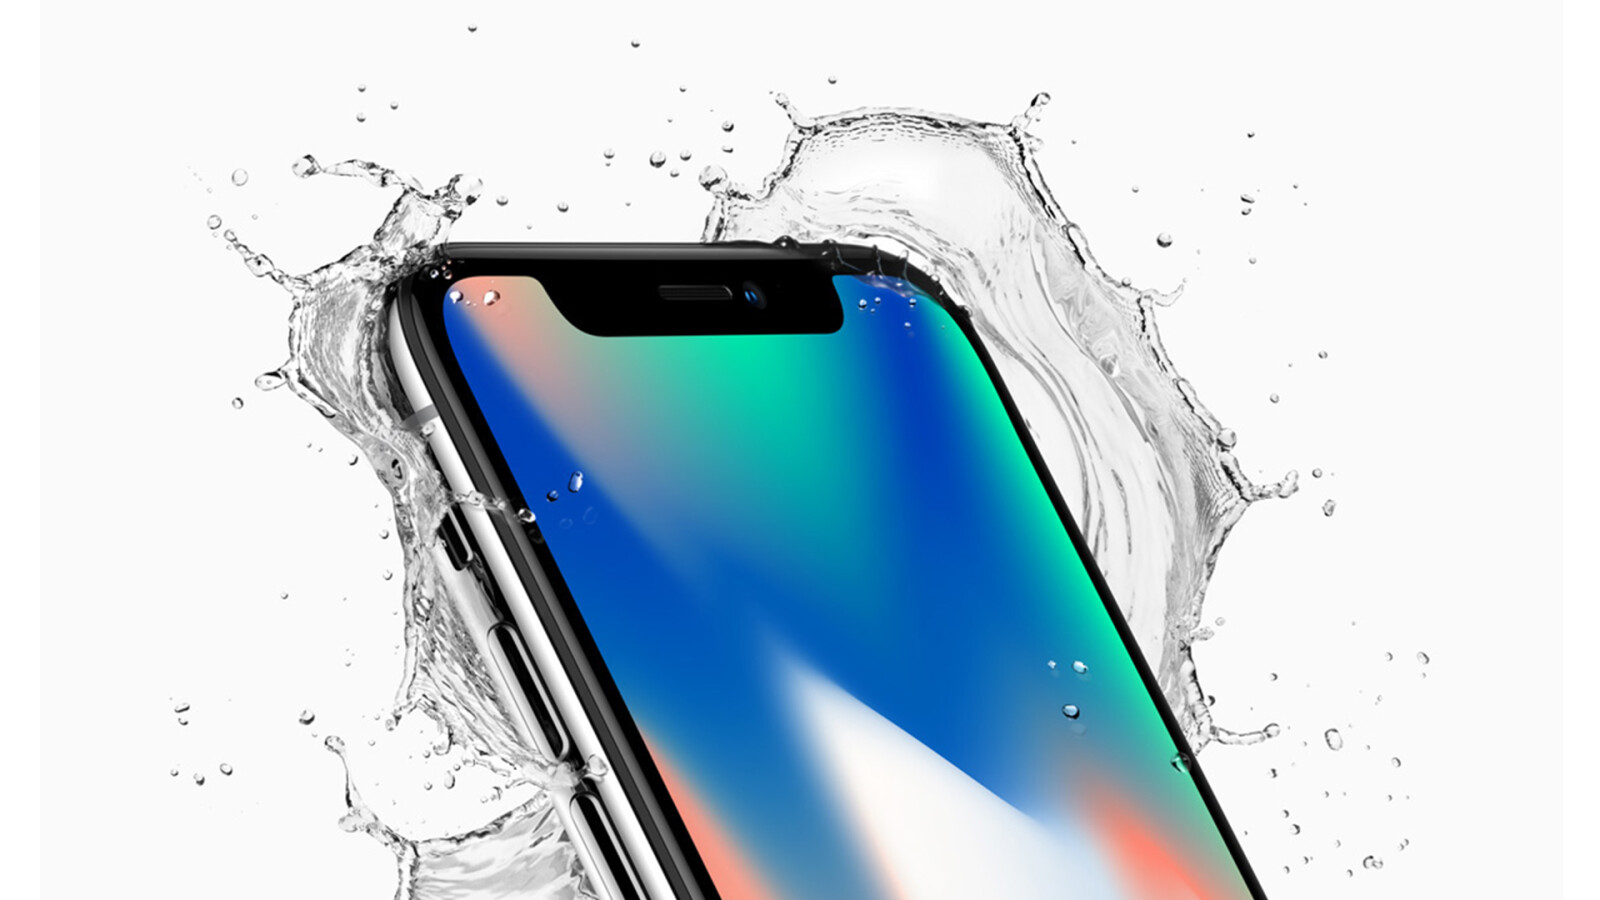 iphone 10 preis bei release